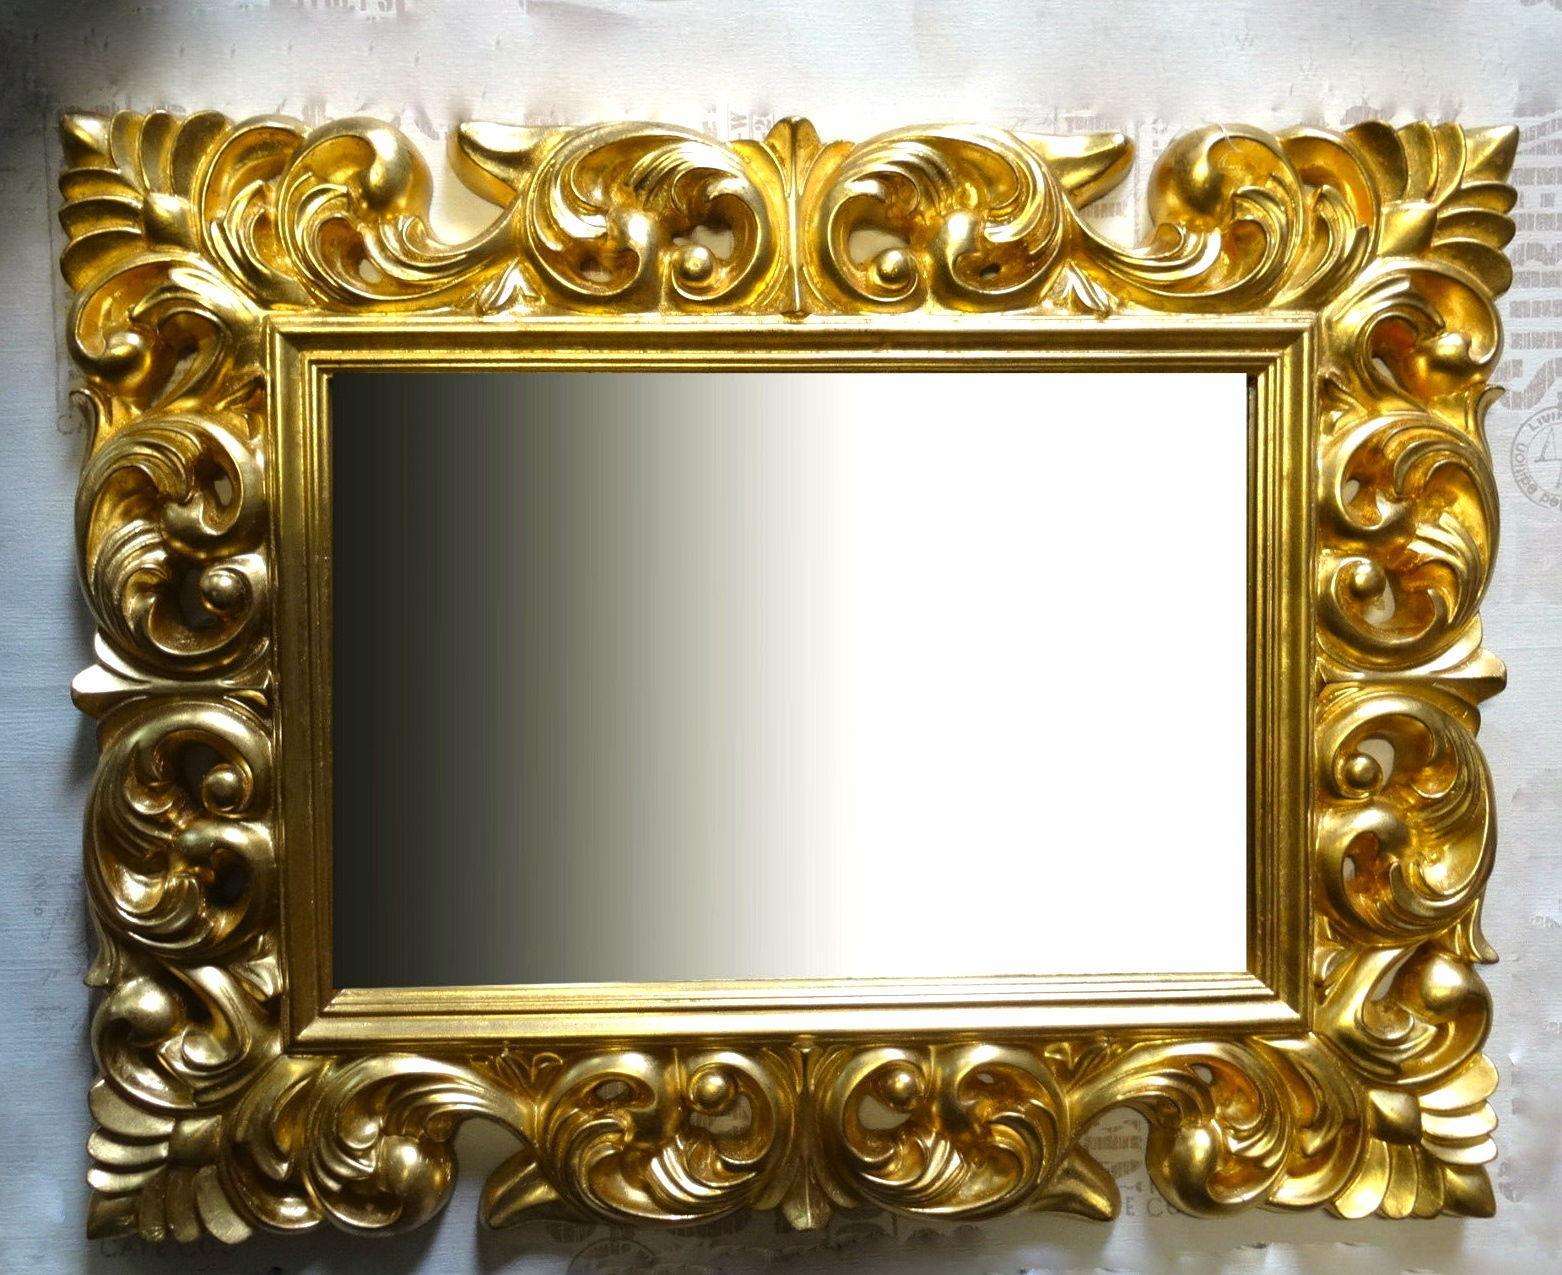 Großer Barock Wandspiegel Ornament 70x90 Standspiegel